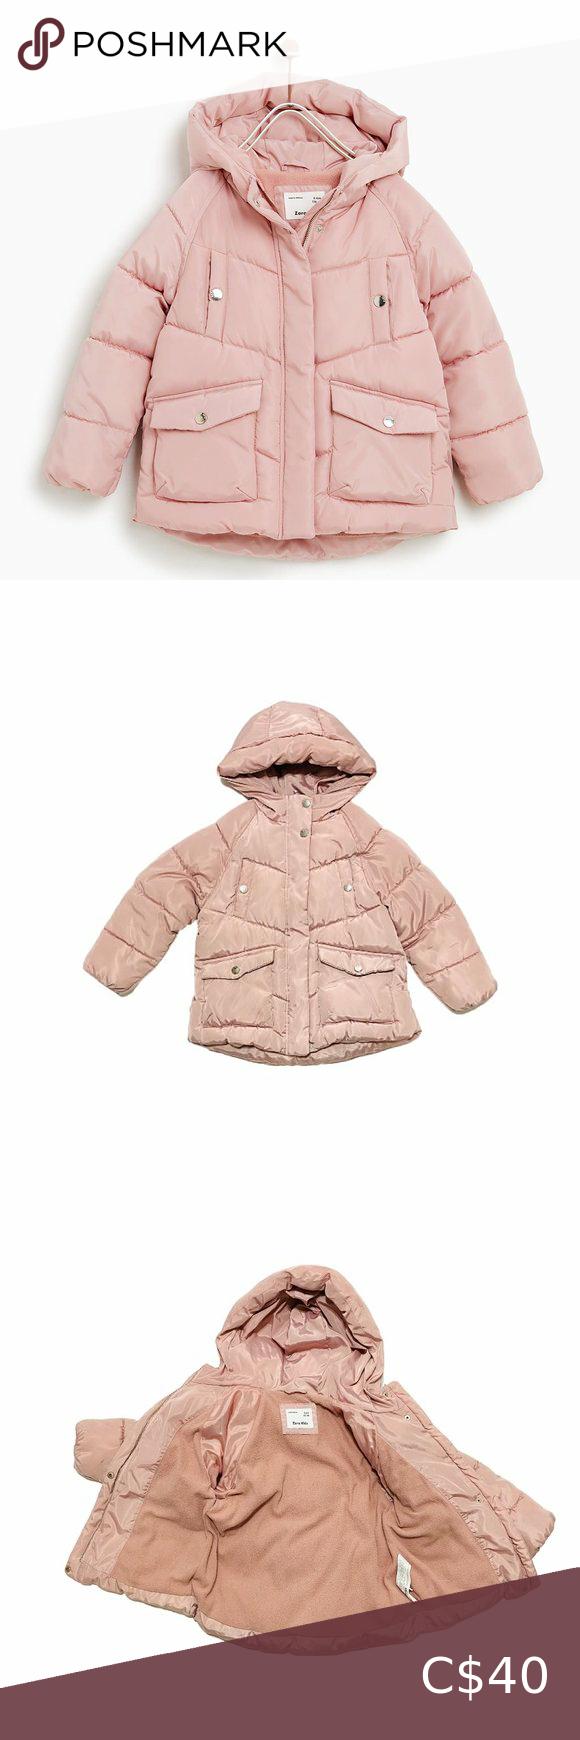 Zara Shiny Pink Puffer Jacket Girls Puffer Coat Pink Puffer Jacket Zara Kids Coats [ 1740 x 580 Pixel ]